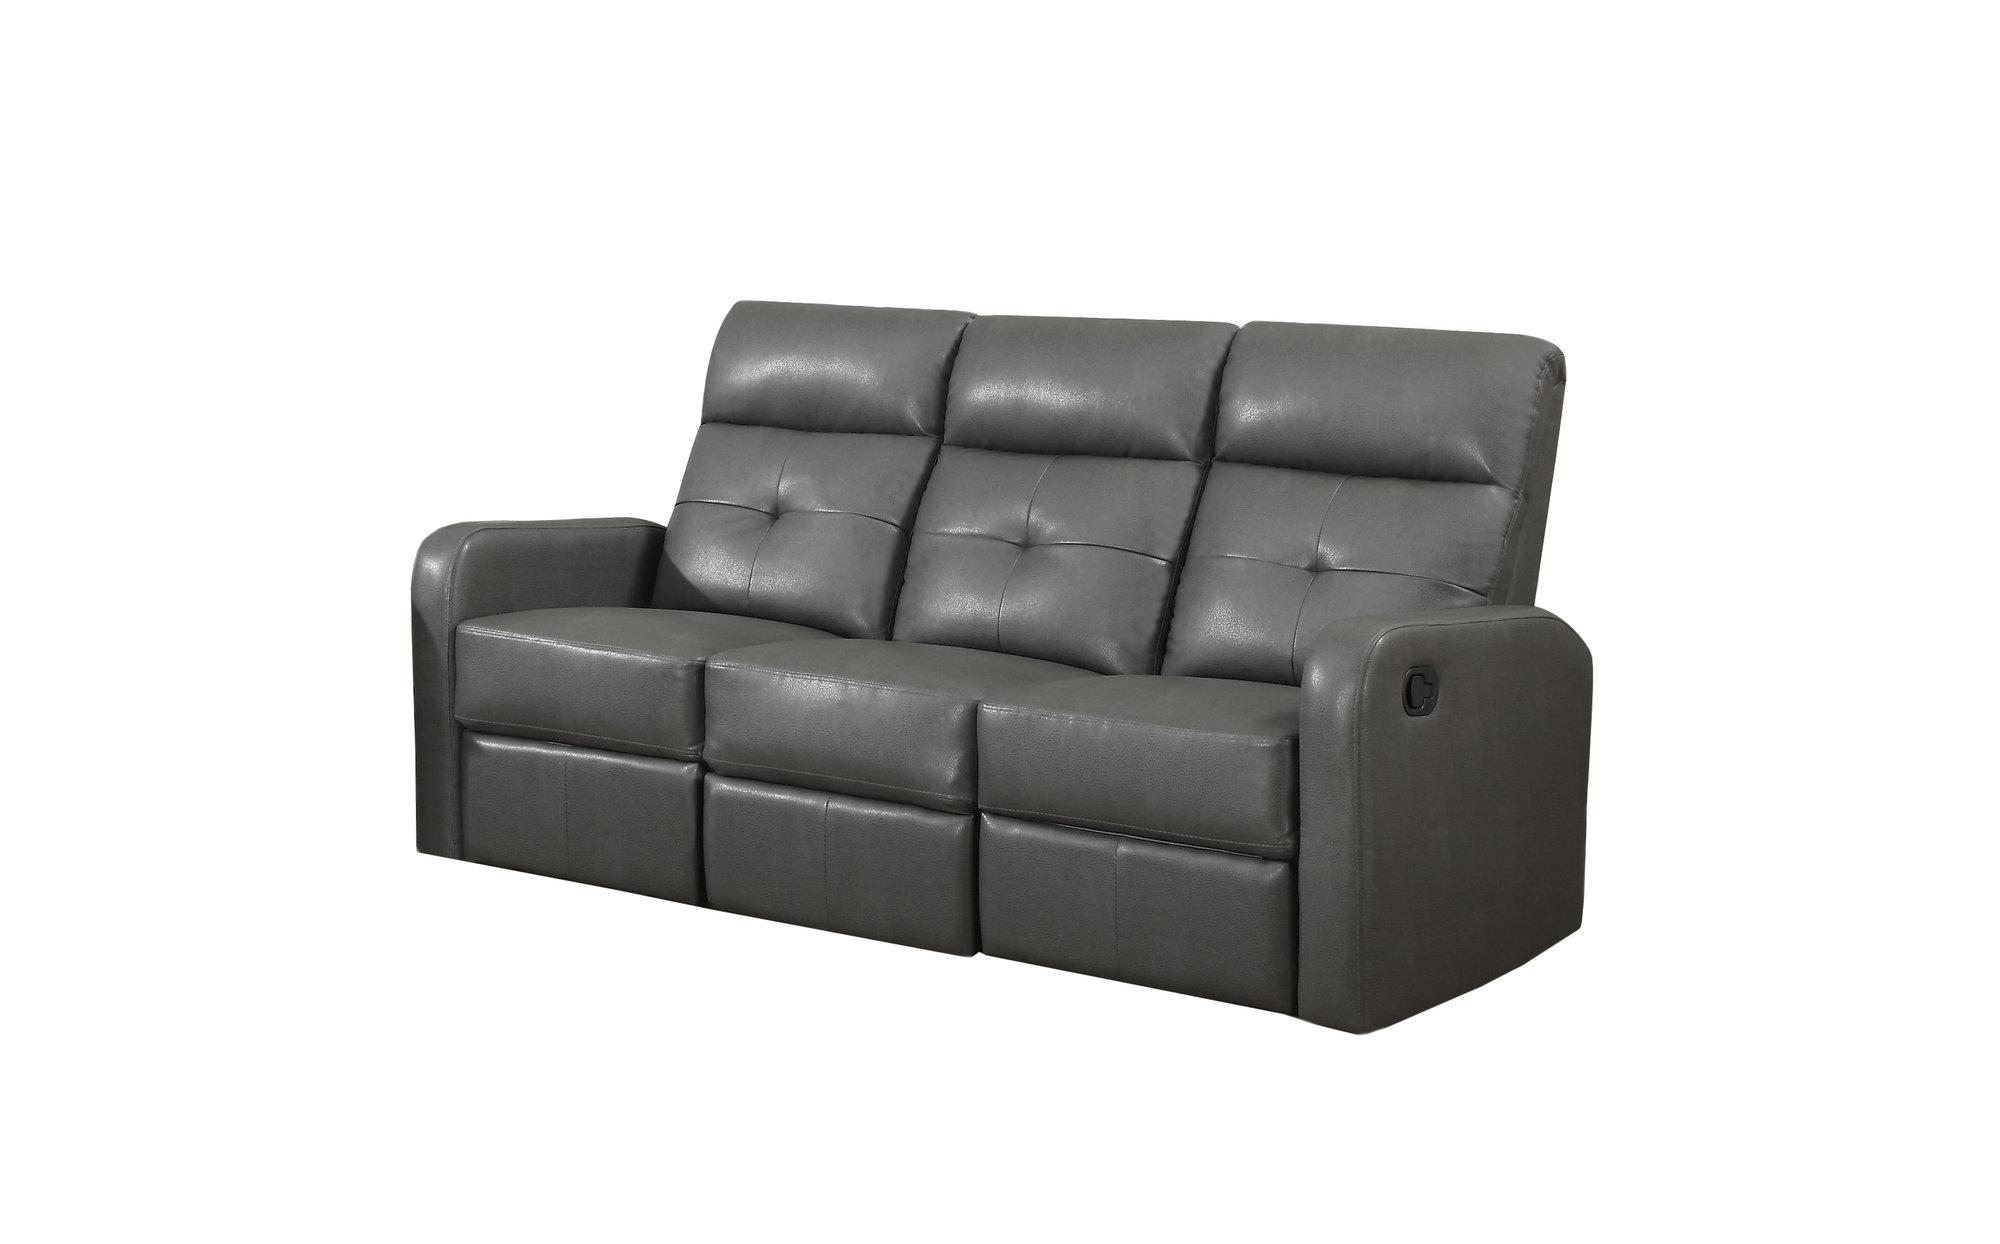 Reclining Sofa Charcoal Grey Bonded